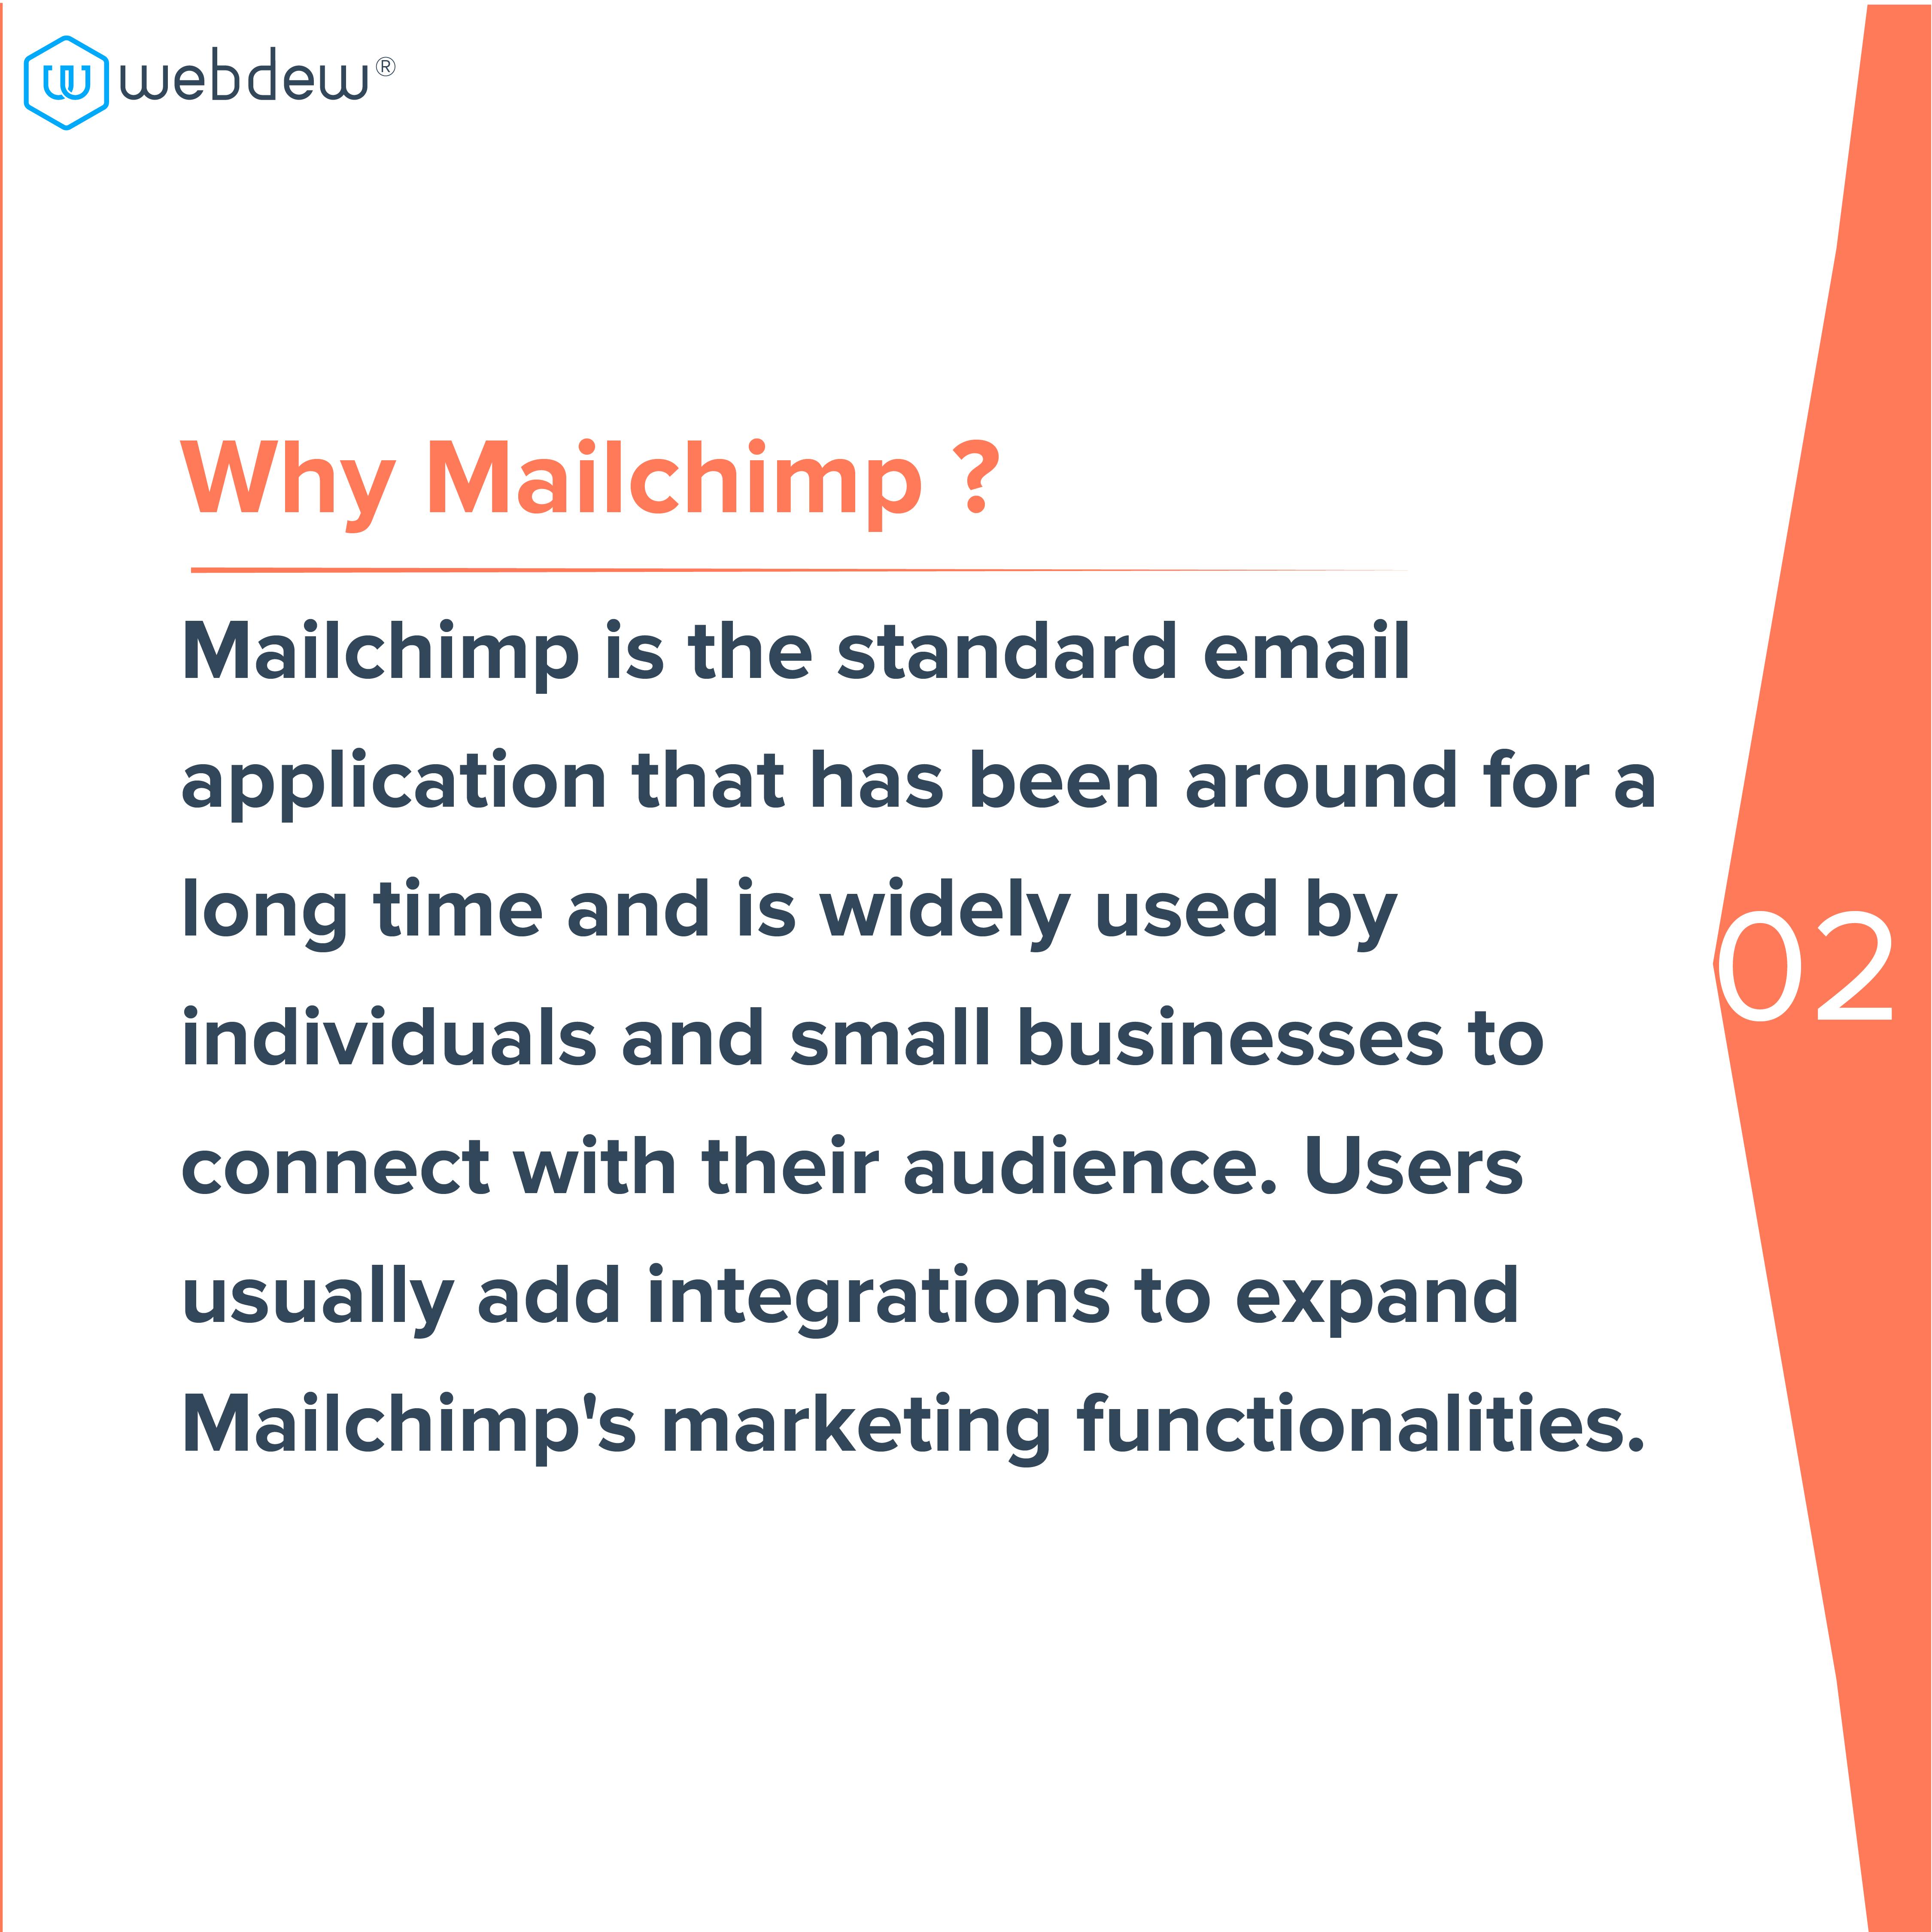 3. why mailchimp